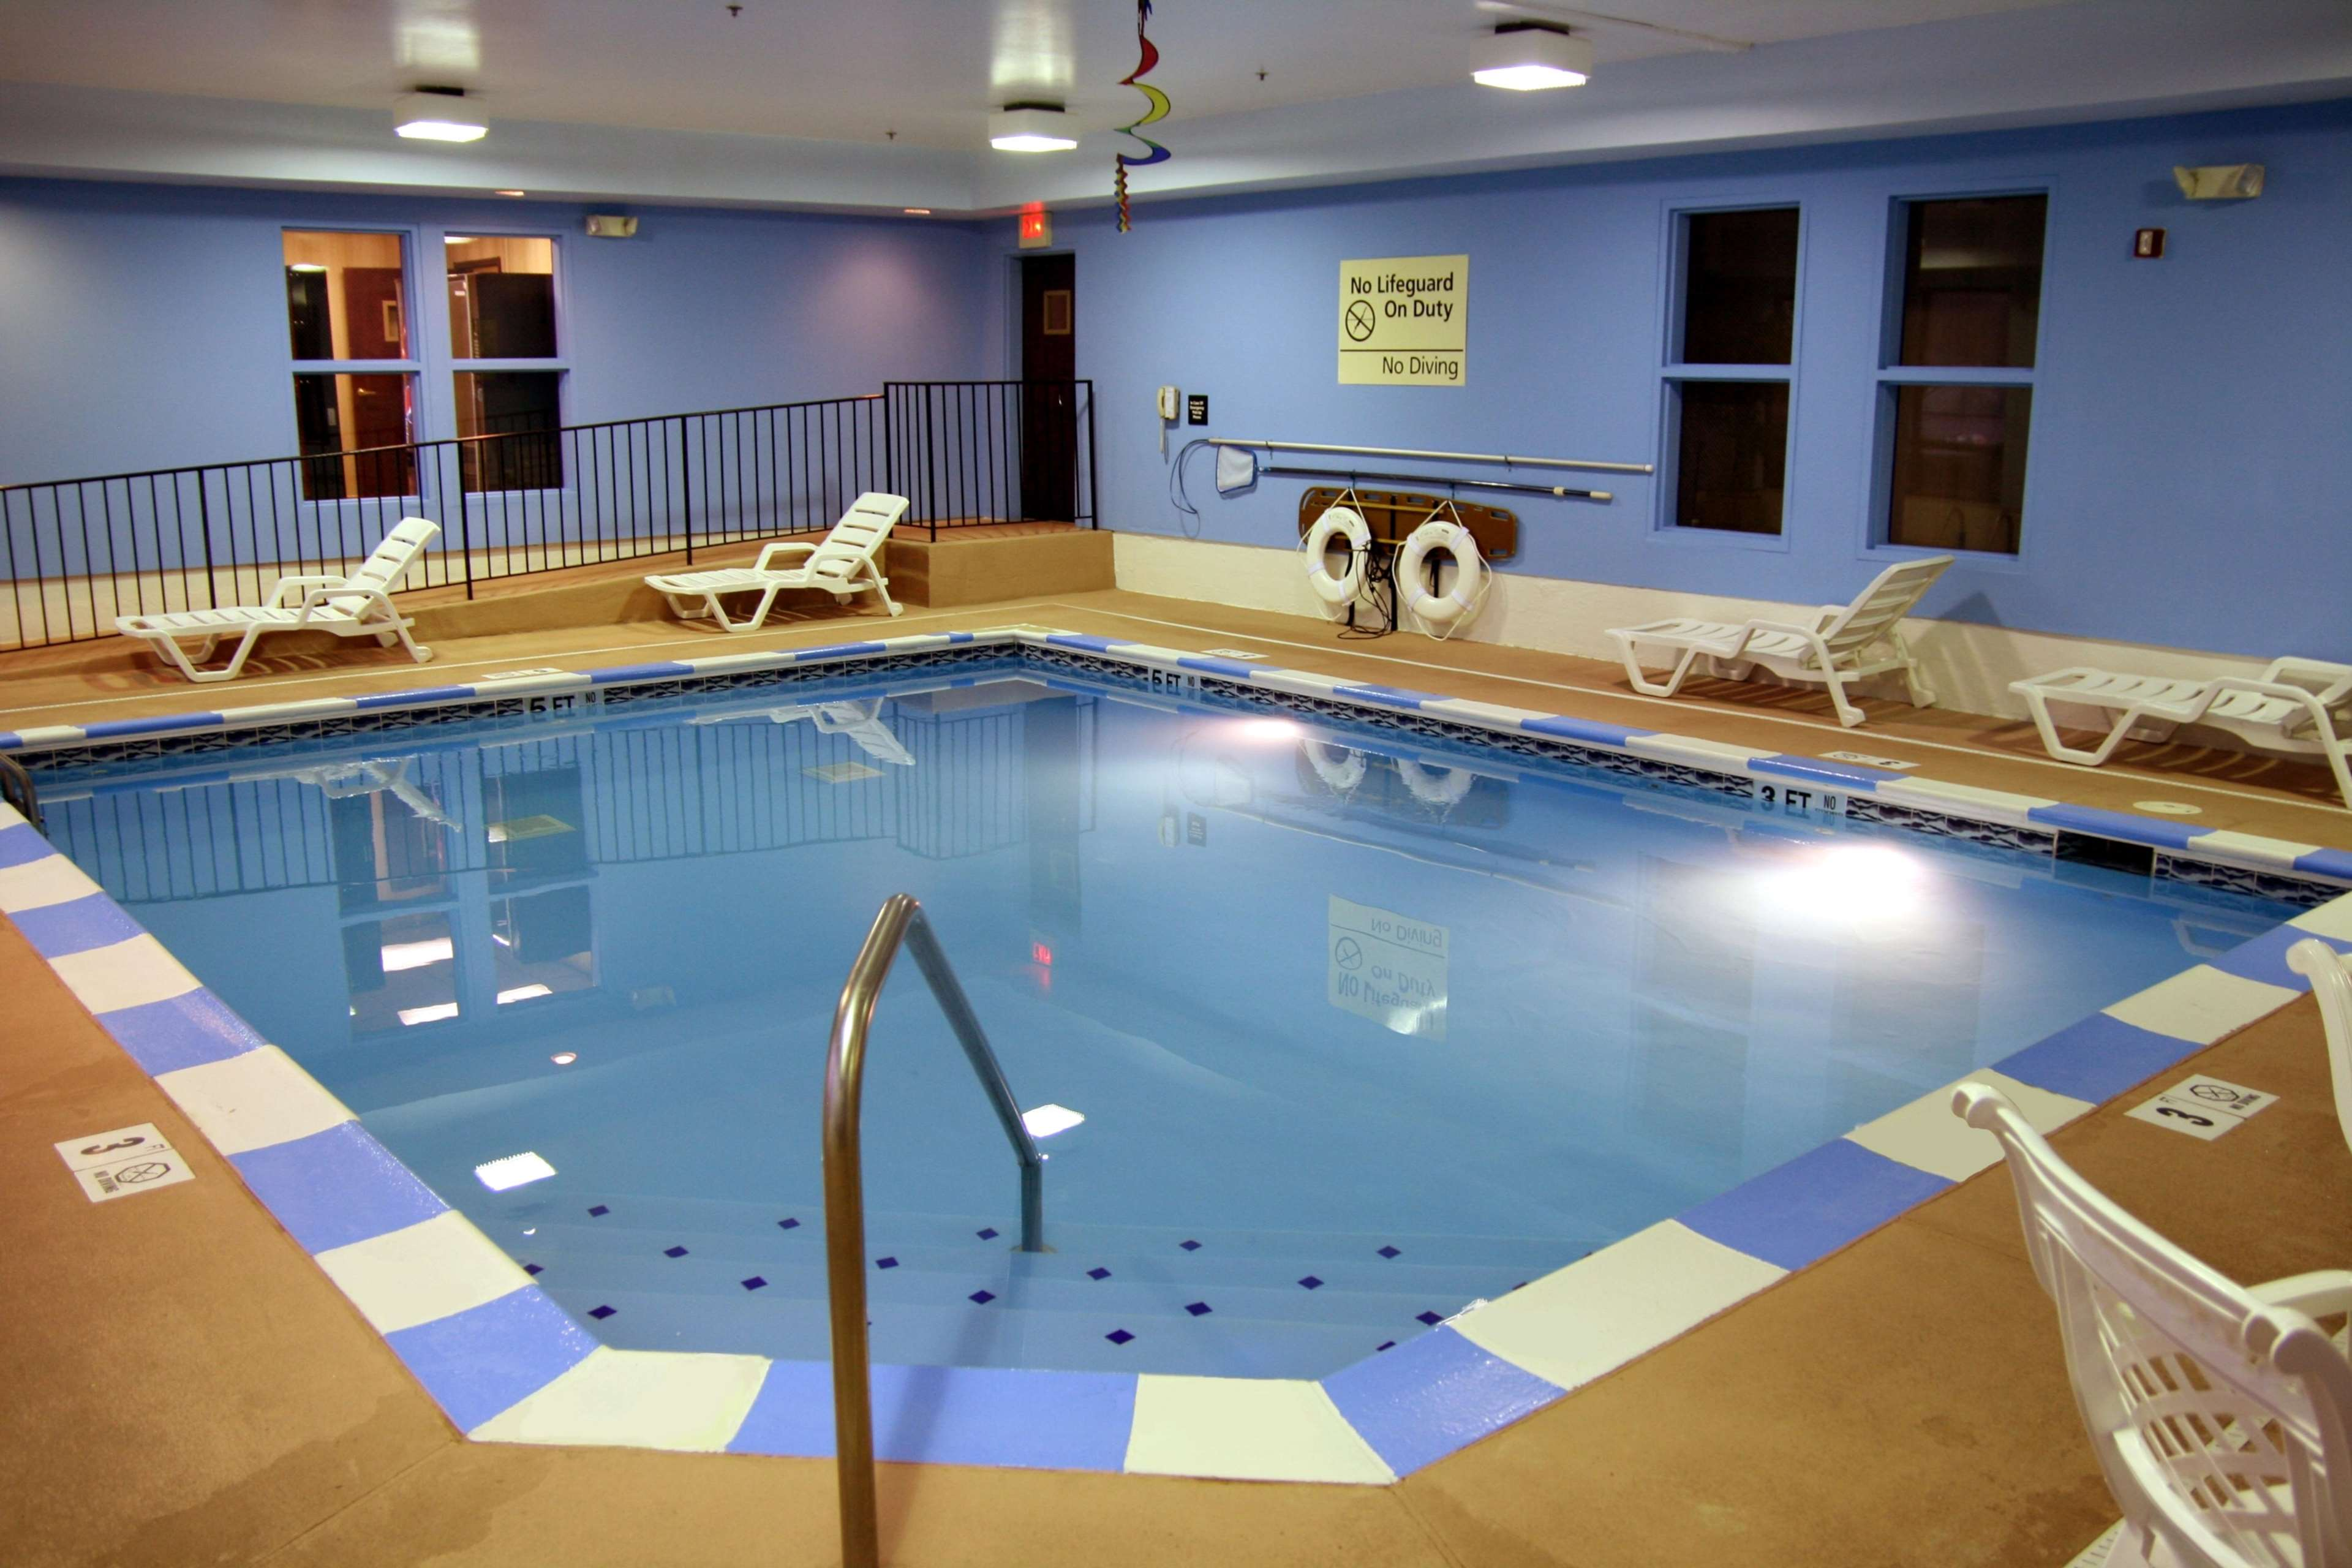 Hampton Inn Ashland - Ashland, KY 41102 - (606)928-2888   ShowMeLocal.com